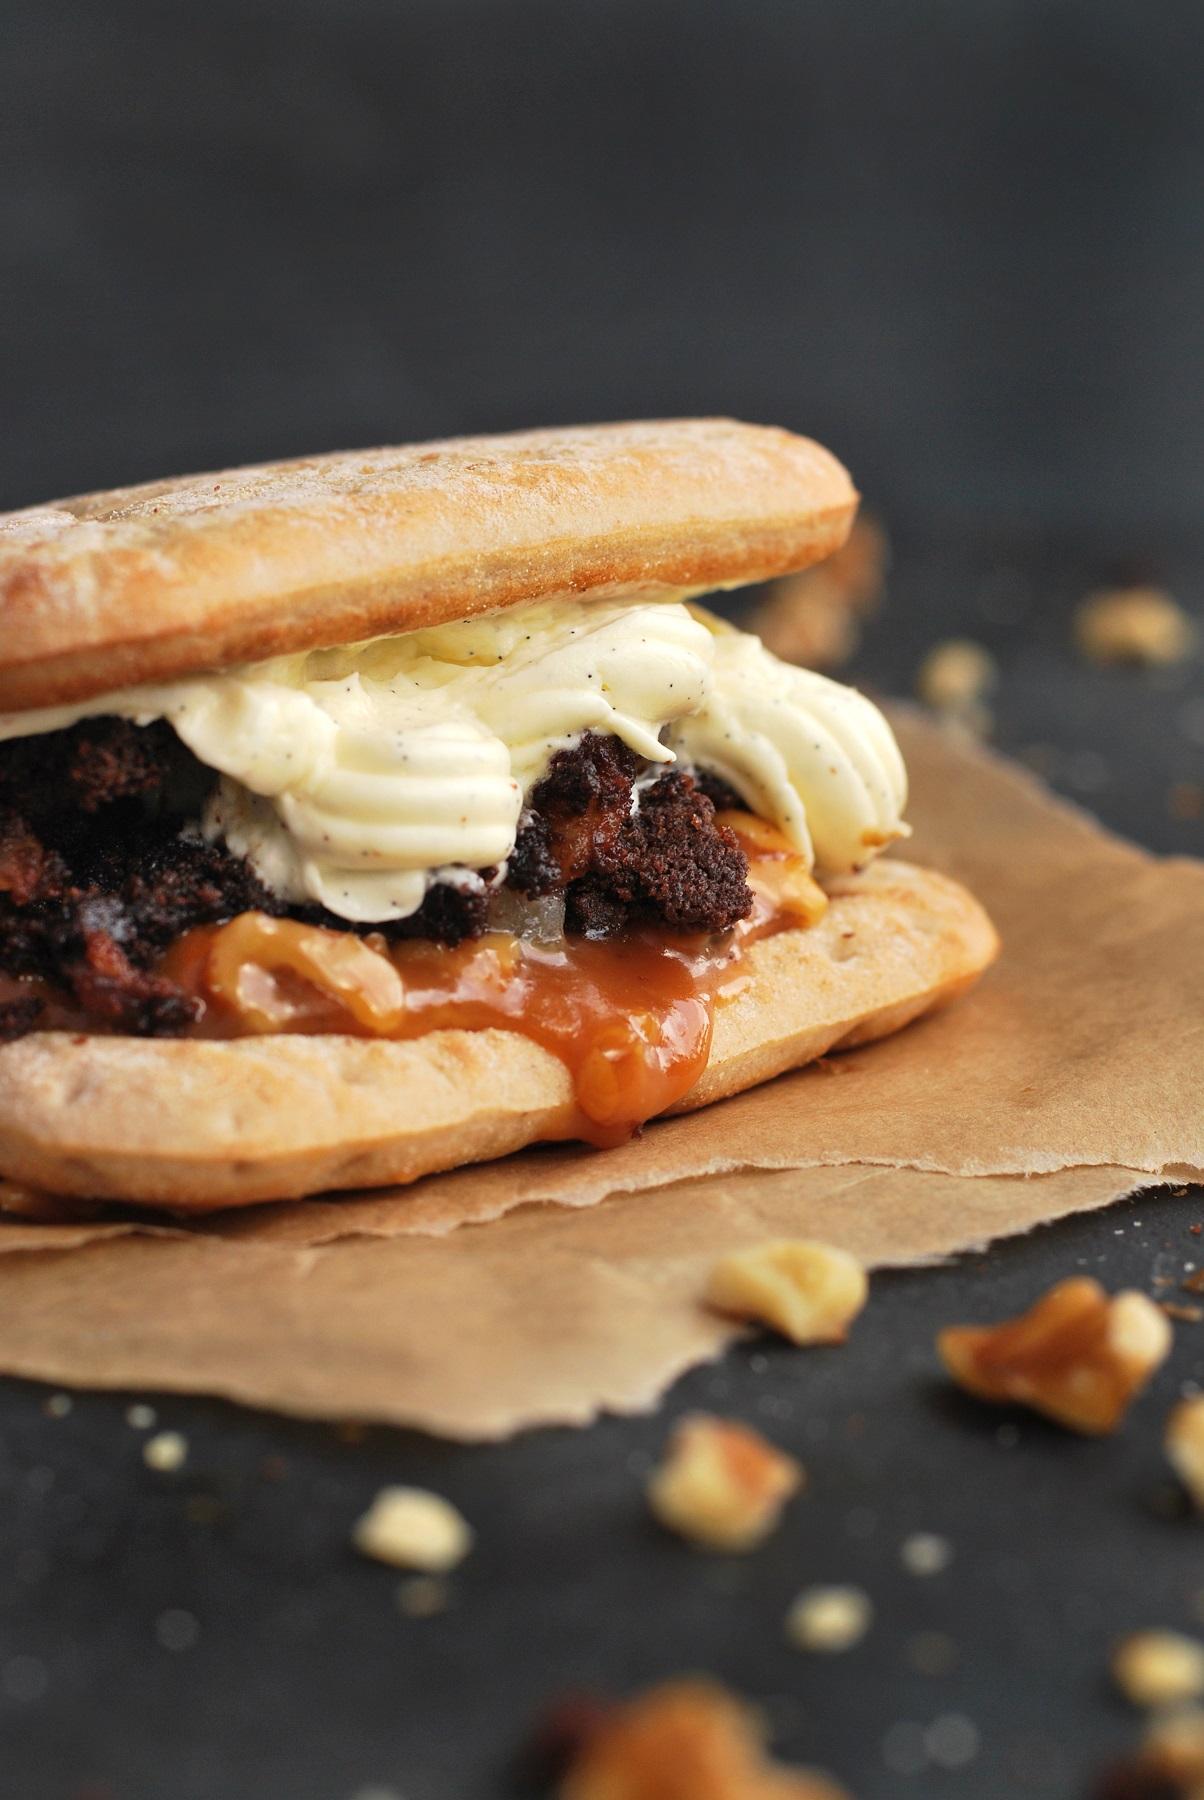 Soft Bröd Rezept : s e burger mit dem neuen soft br d ~ Watch28wear.com Haus und Dekorationen